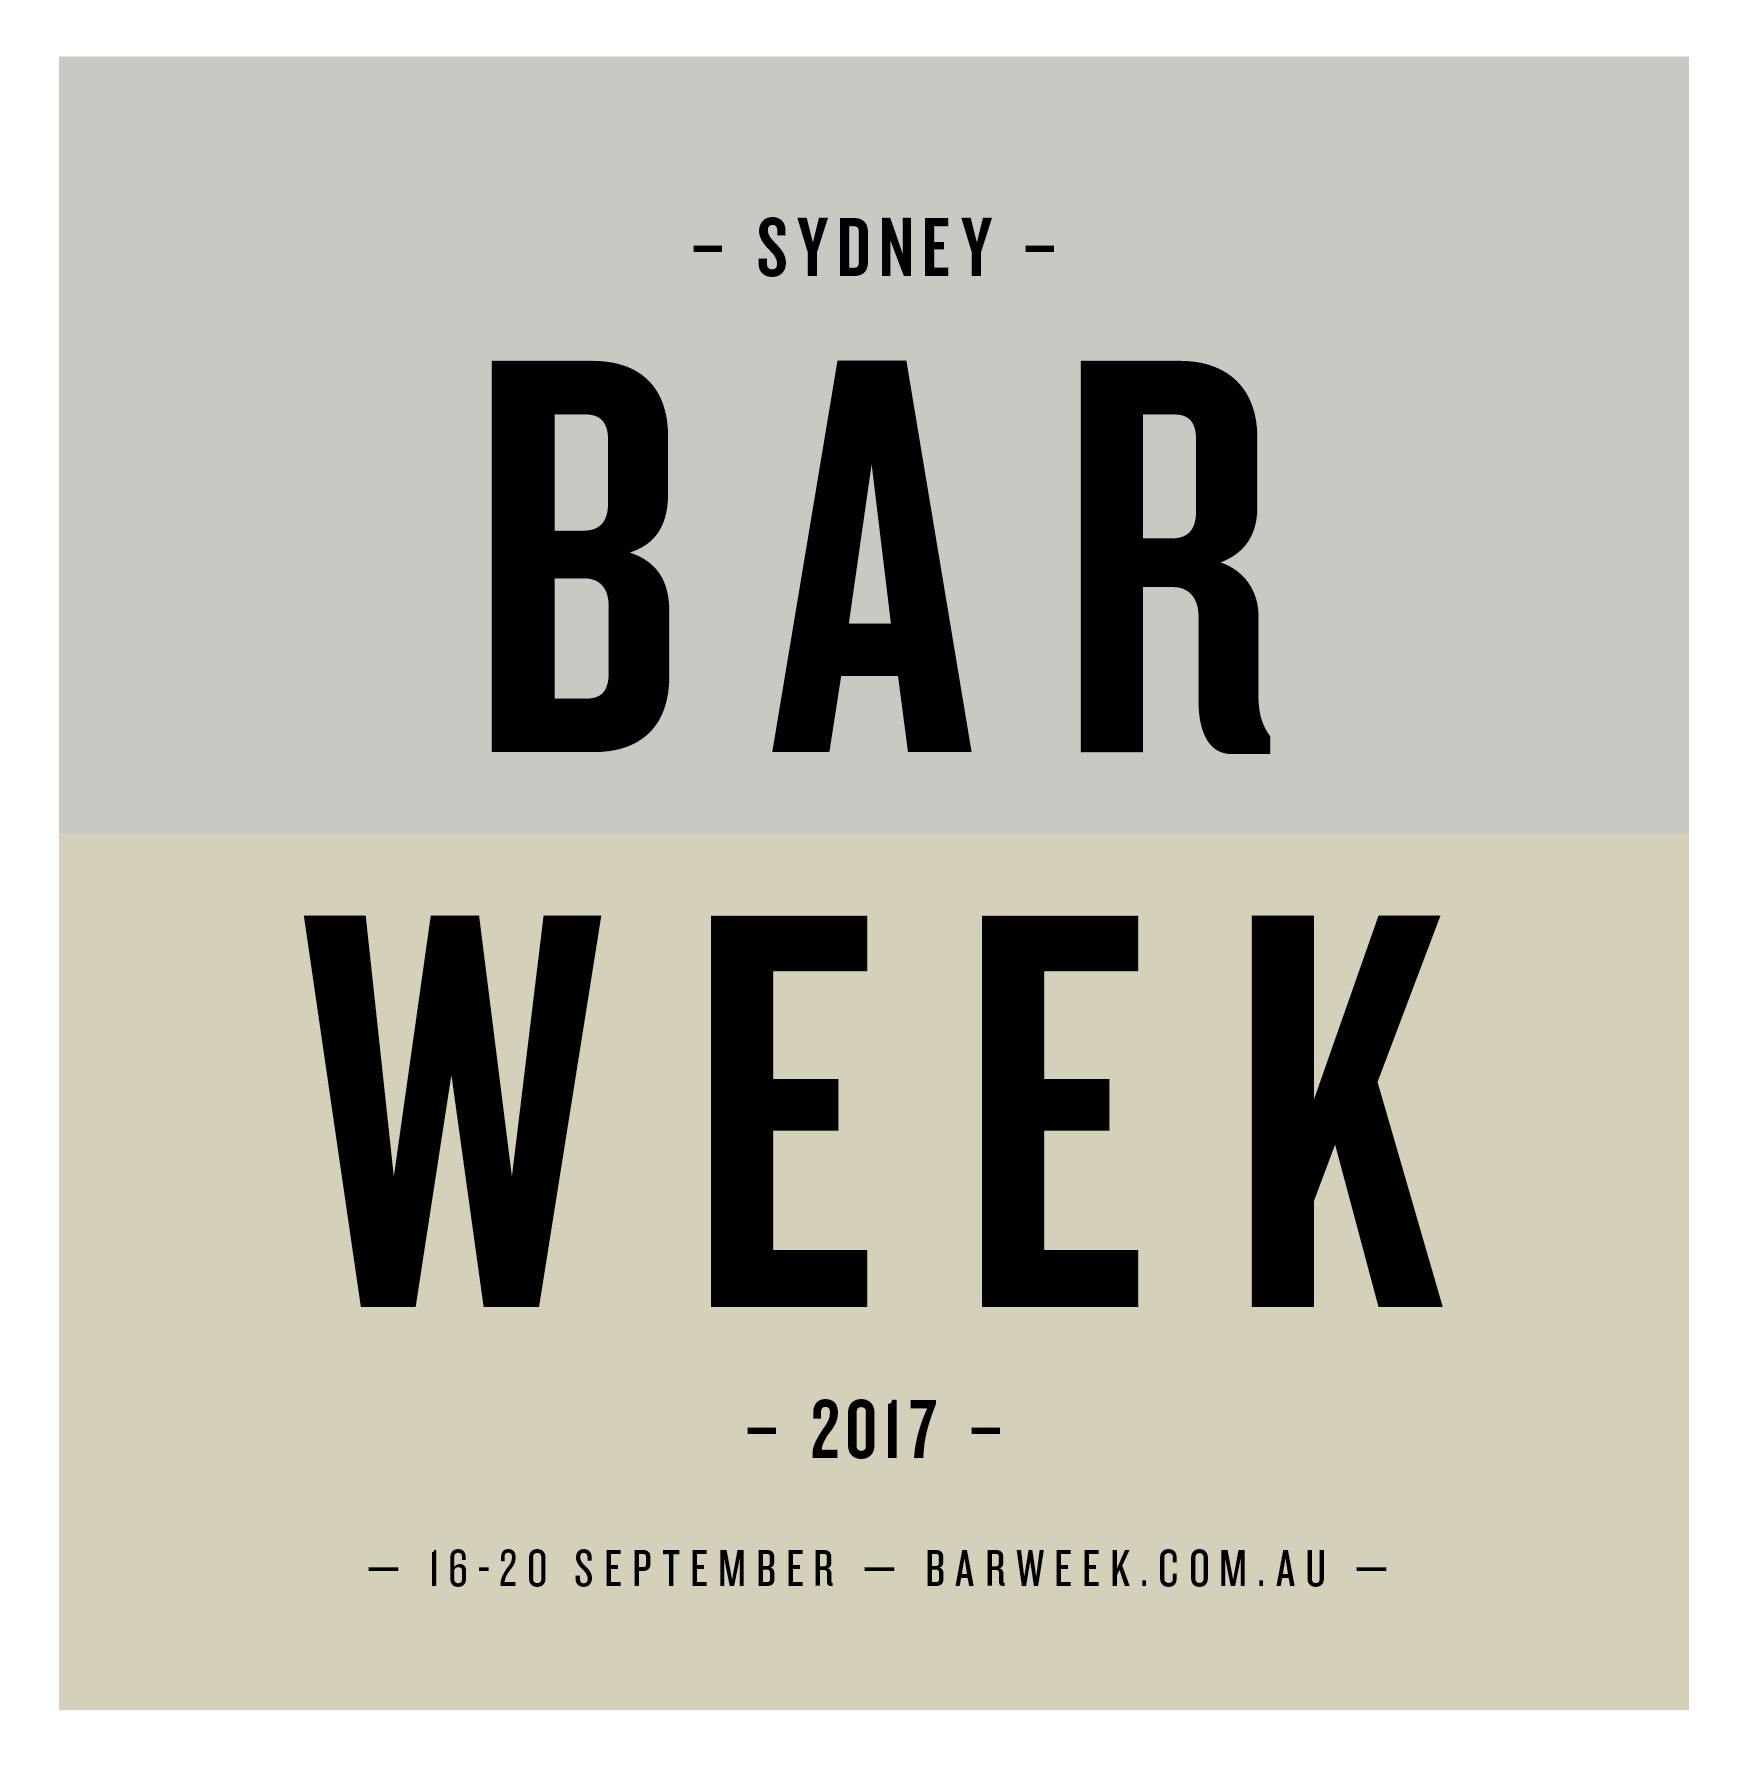 Bar Week 2017